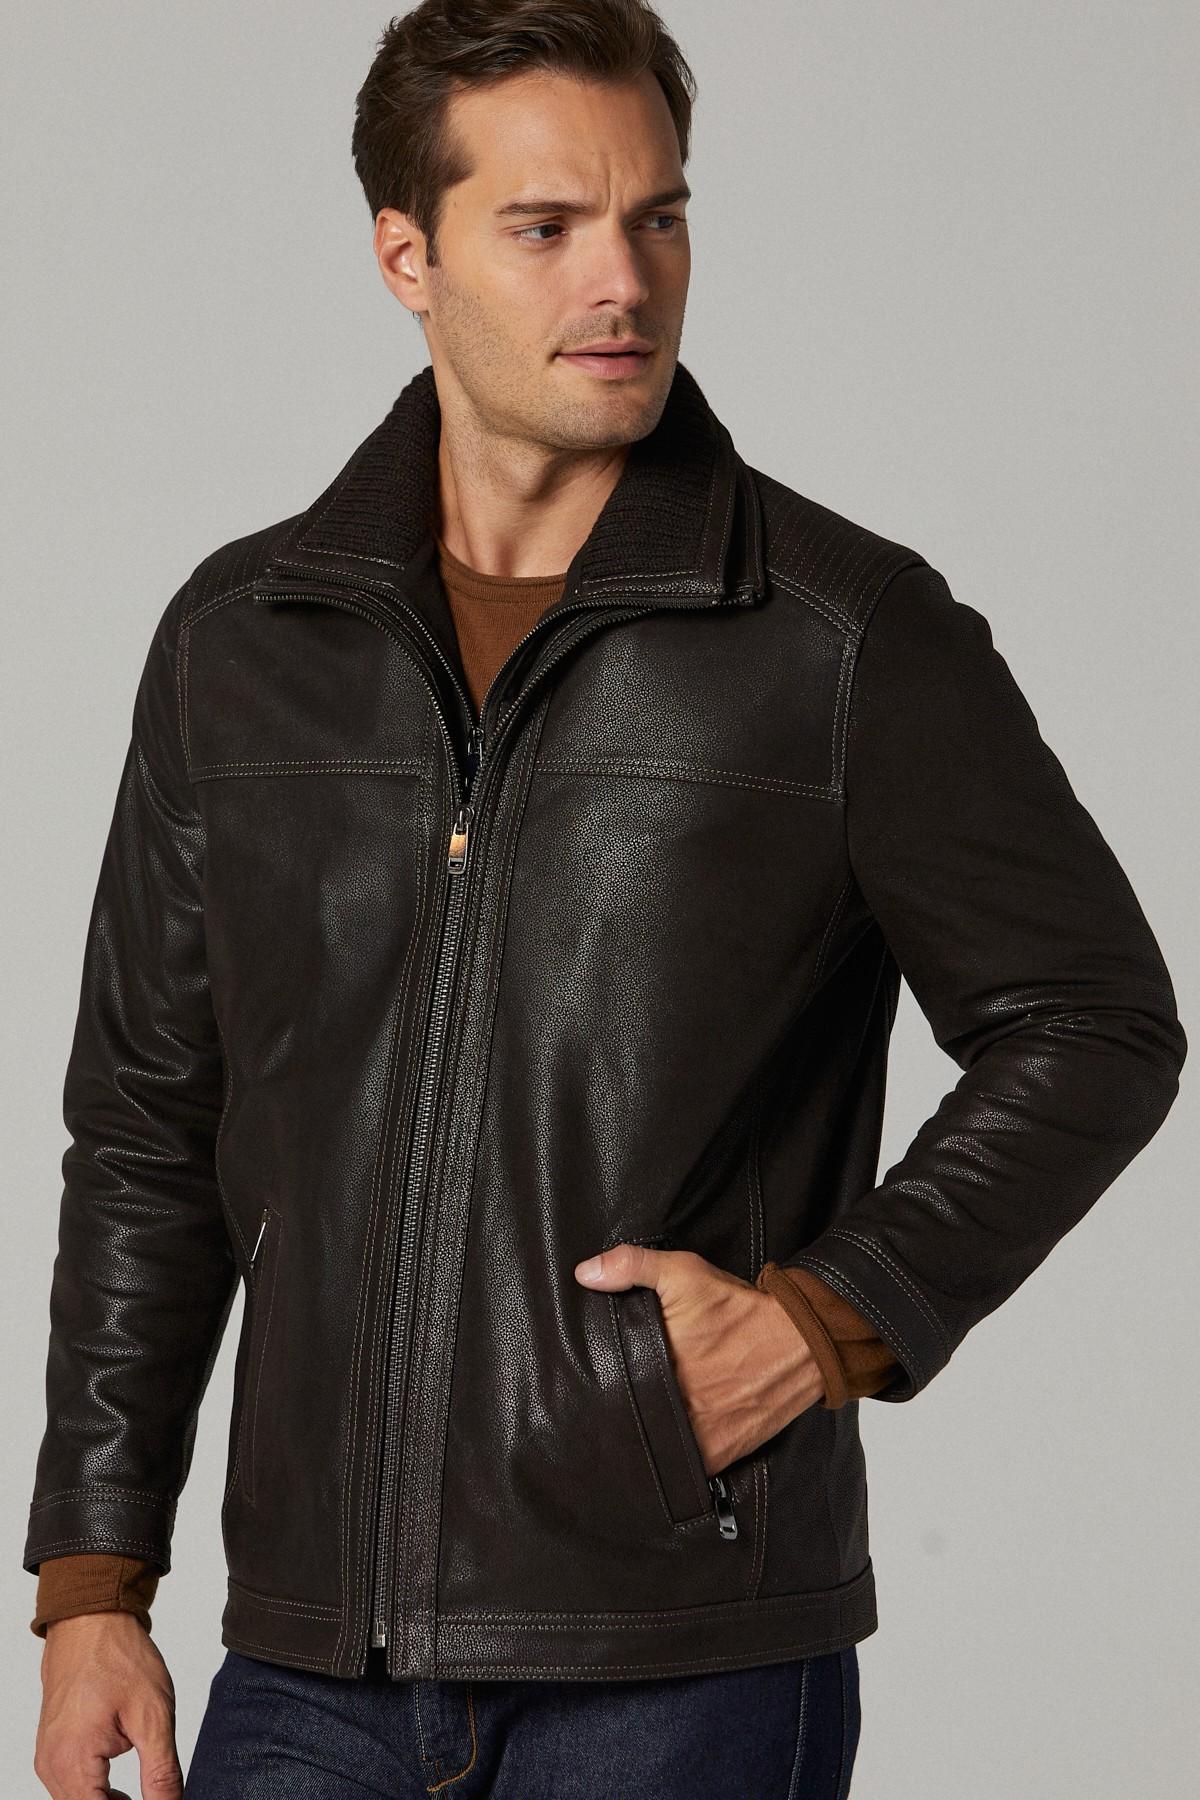 Milwaukee Leather Jackets